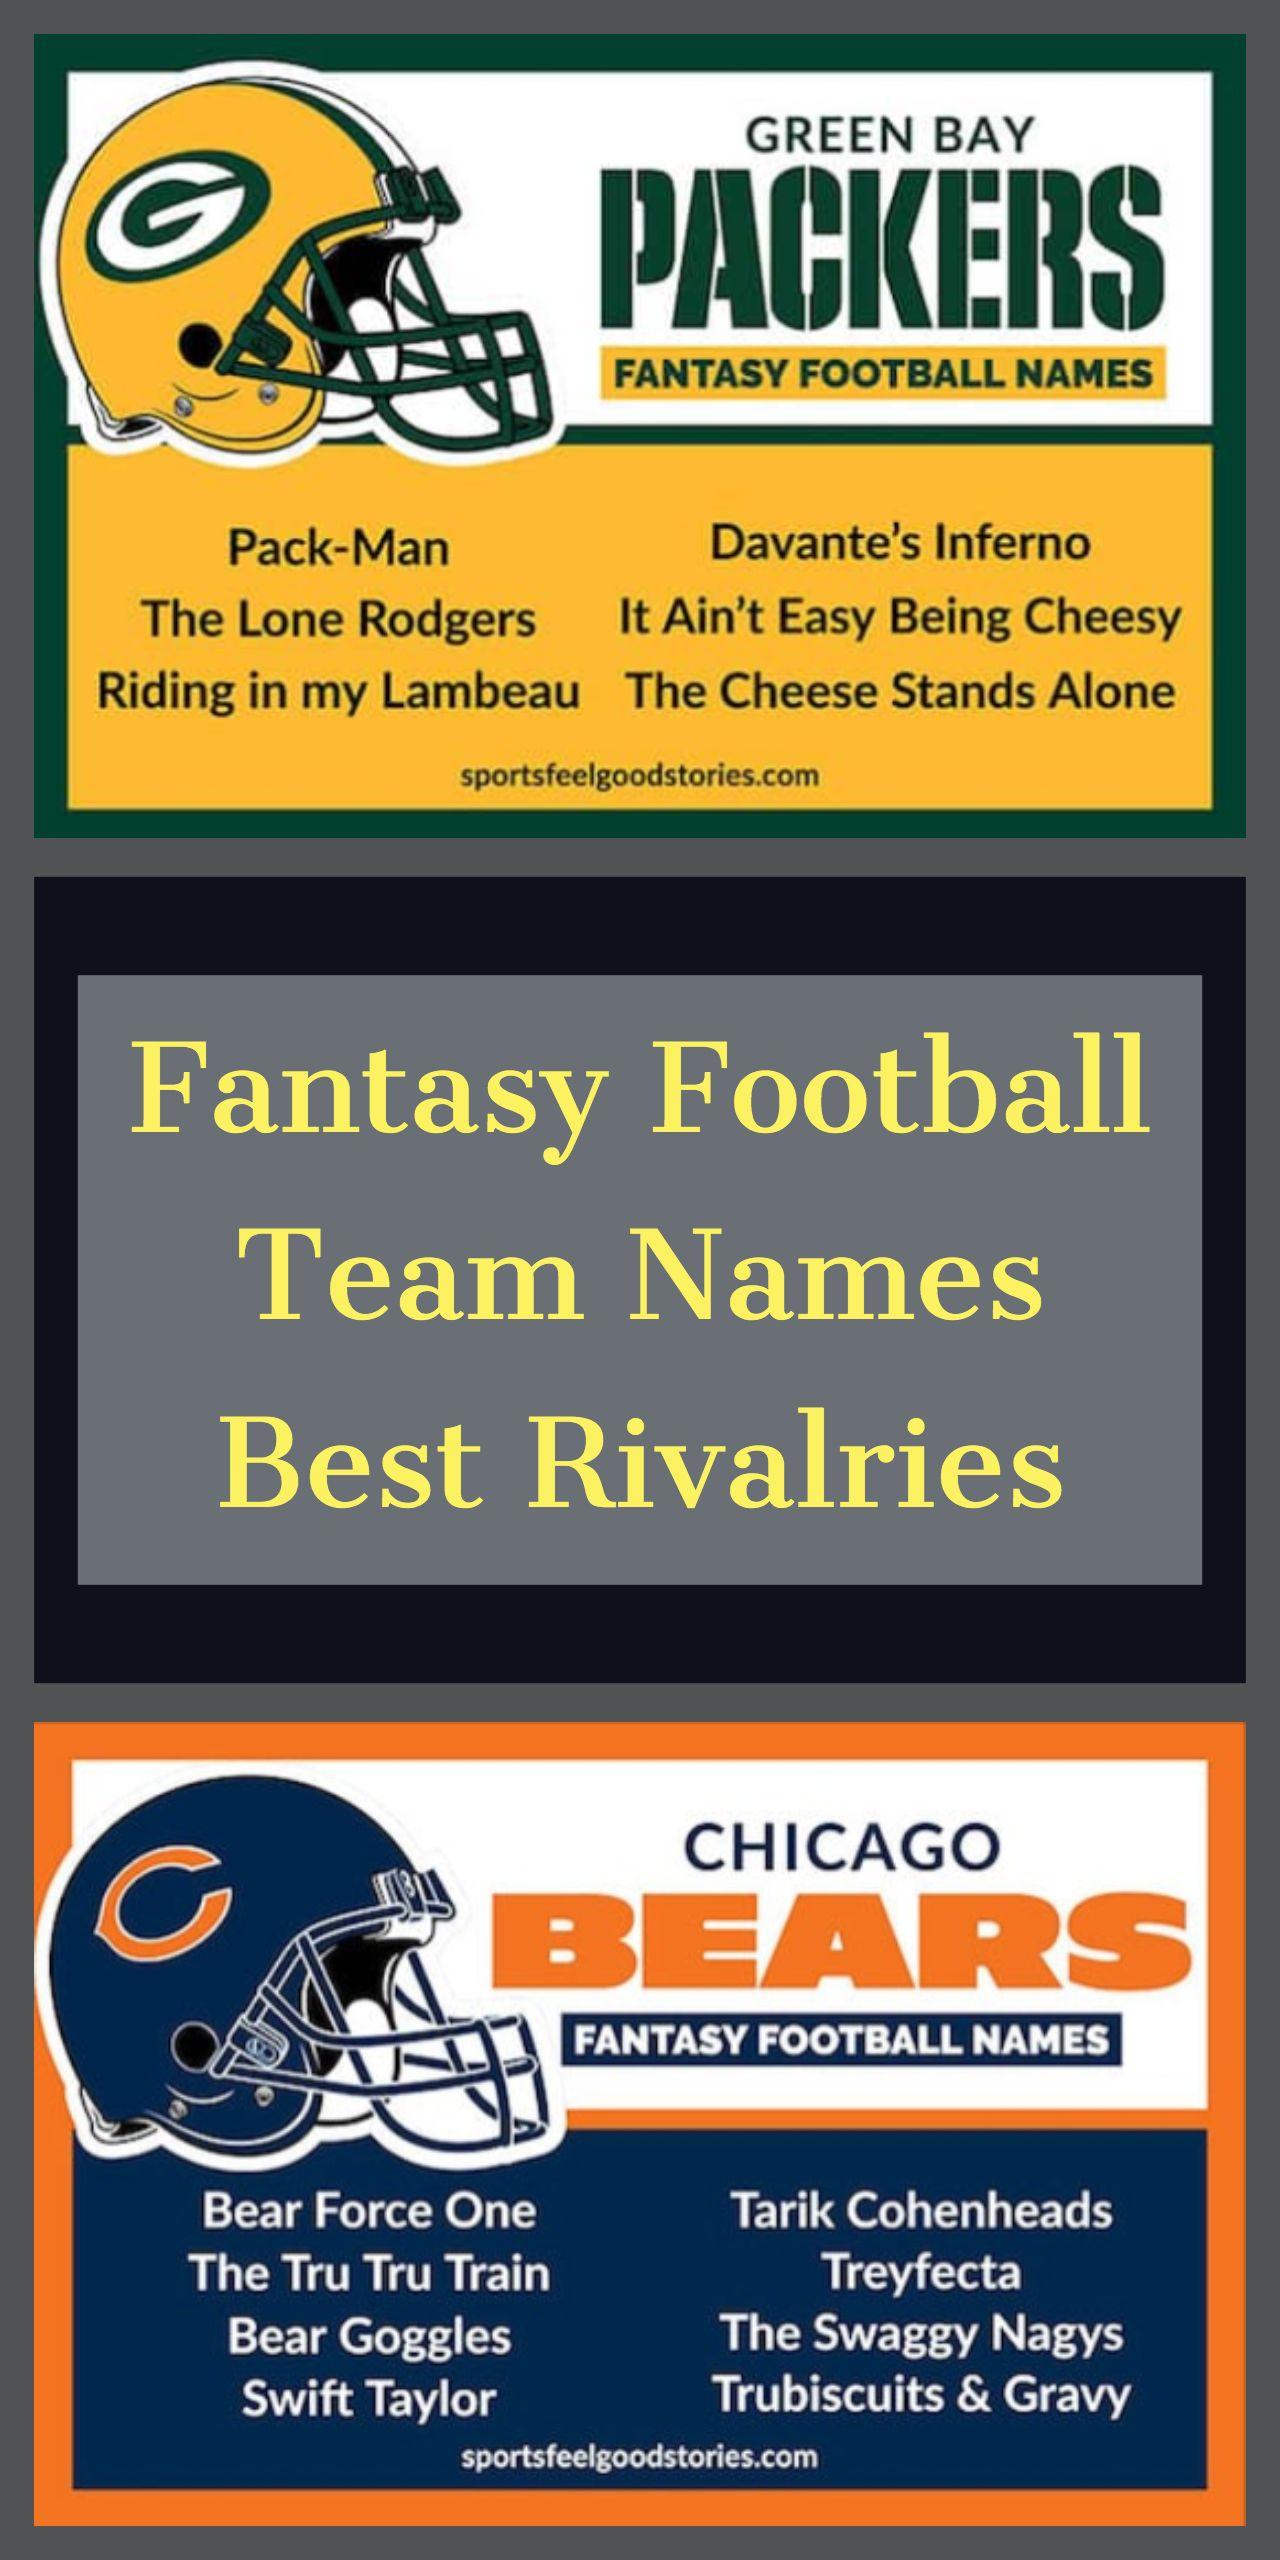 125 Funny Fantasy Football Team Names (2021)